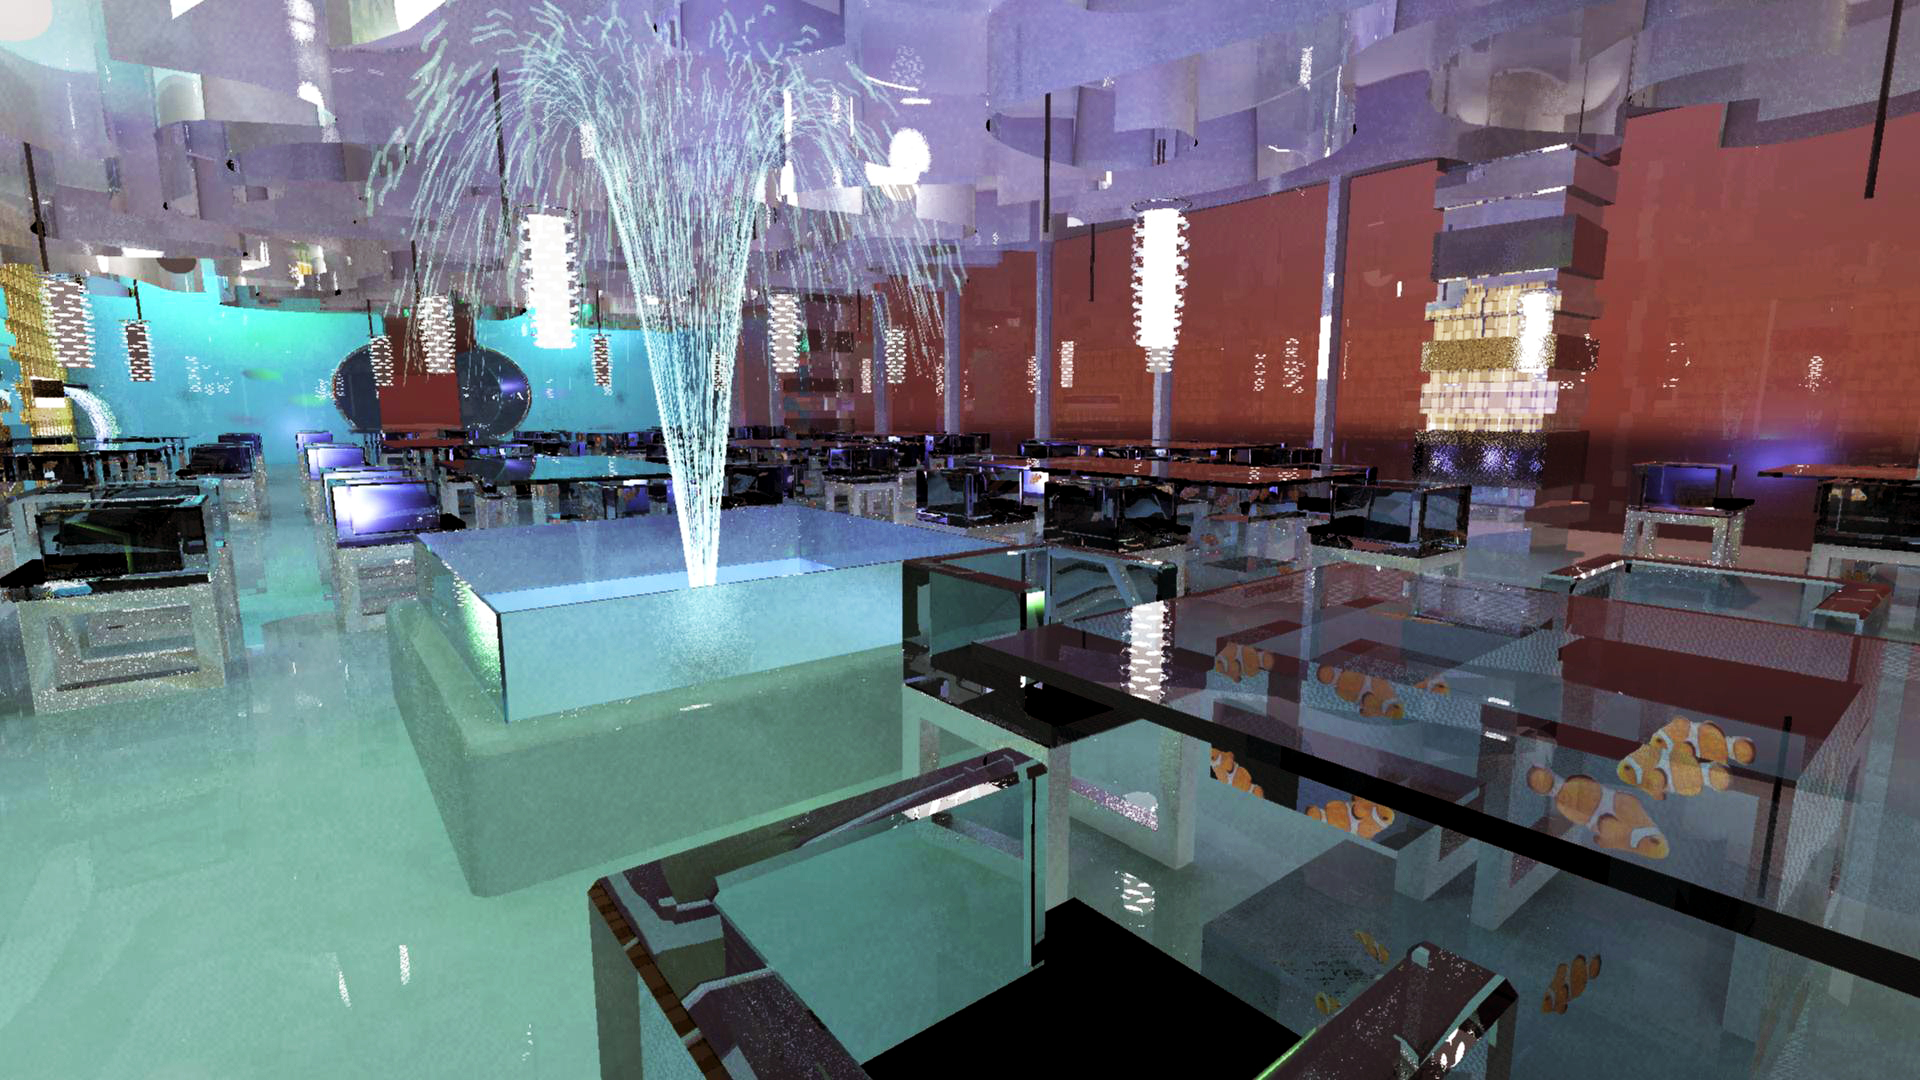 Jeddah Towers Dubai Image